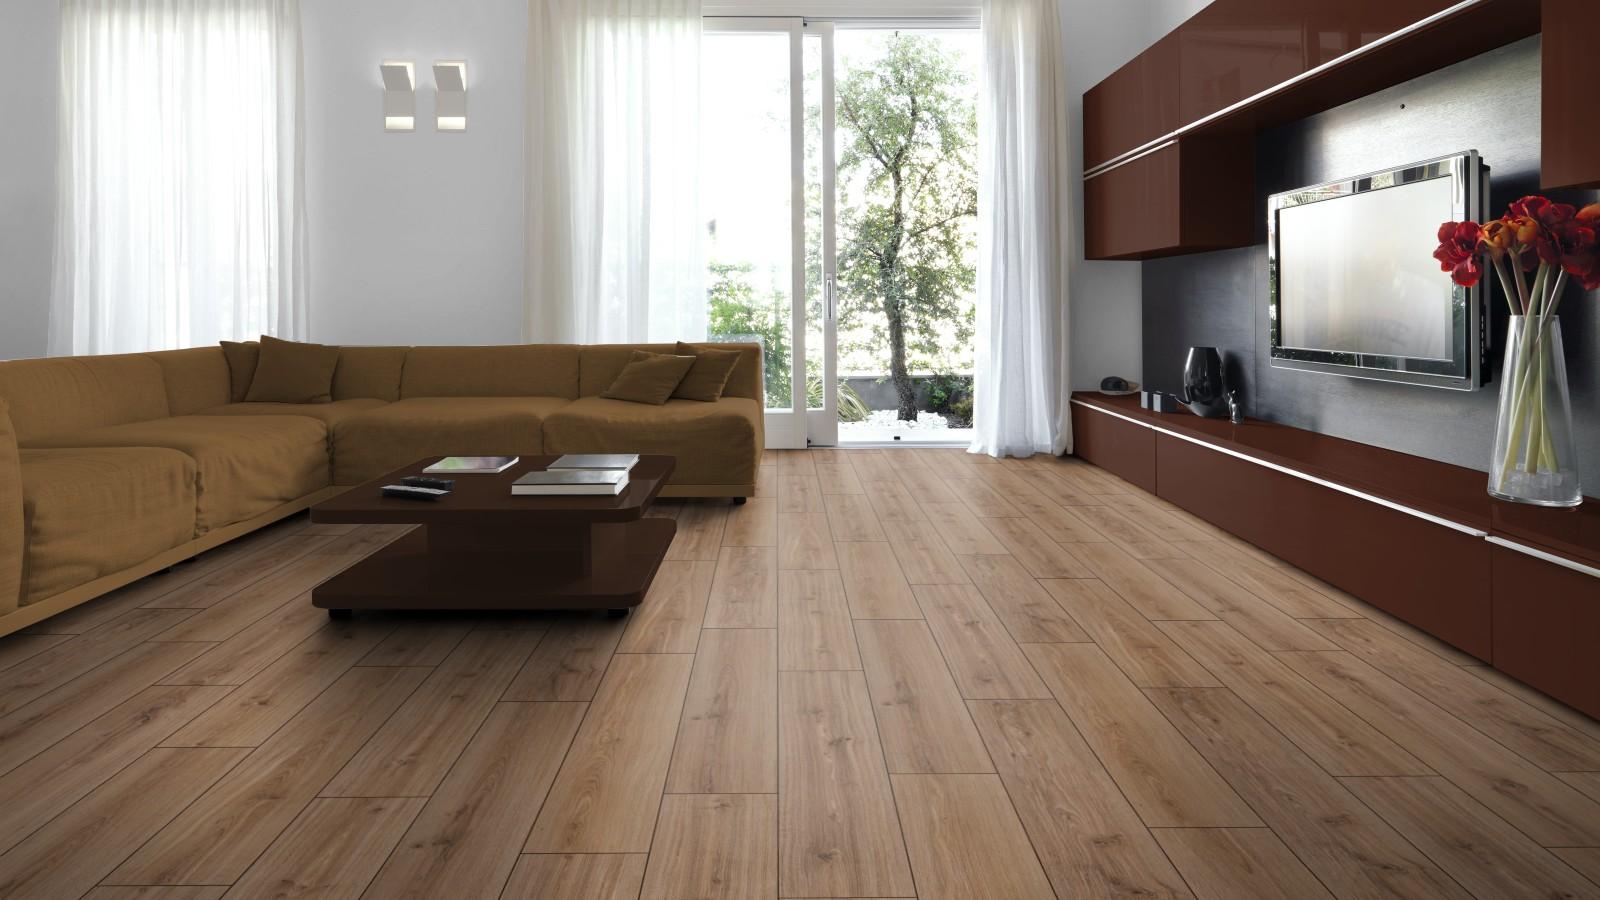 kronotex robusto laminat saverne eiche d3074 holzoptik preisbrecher 24 gmbh laminat. Black Bedroom Furniture Sets. Home Design Ideas